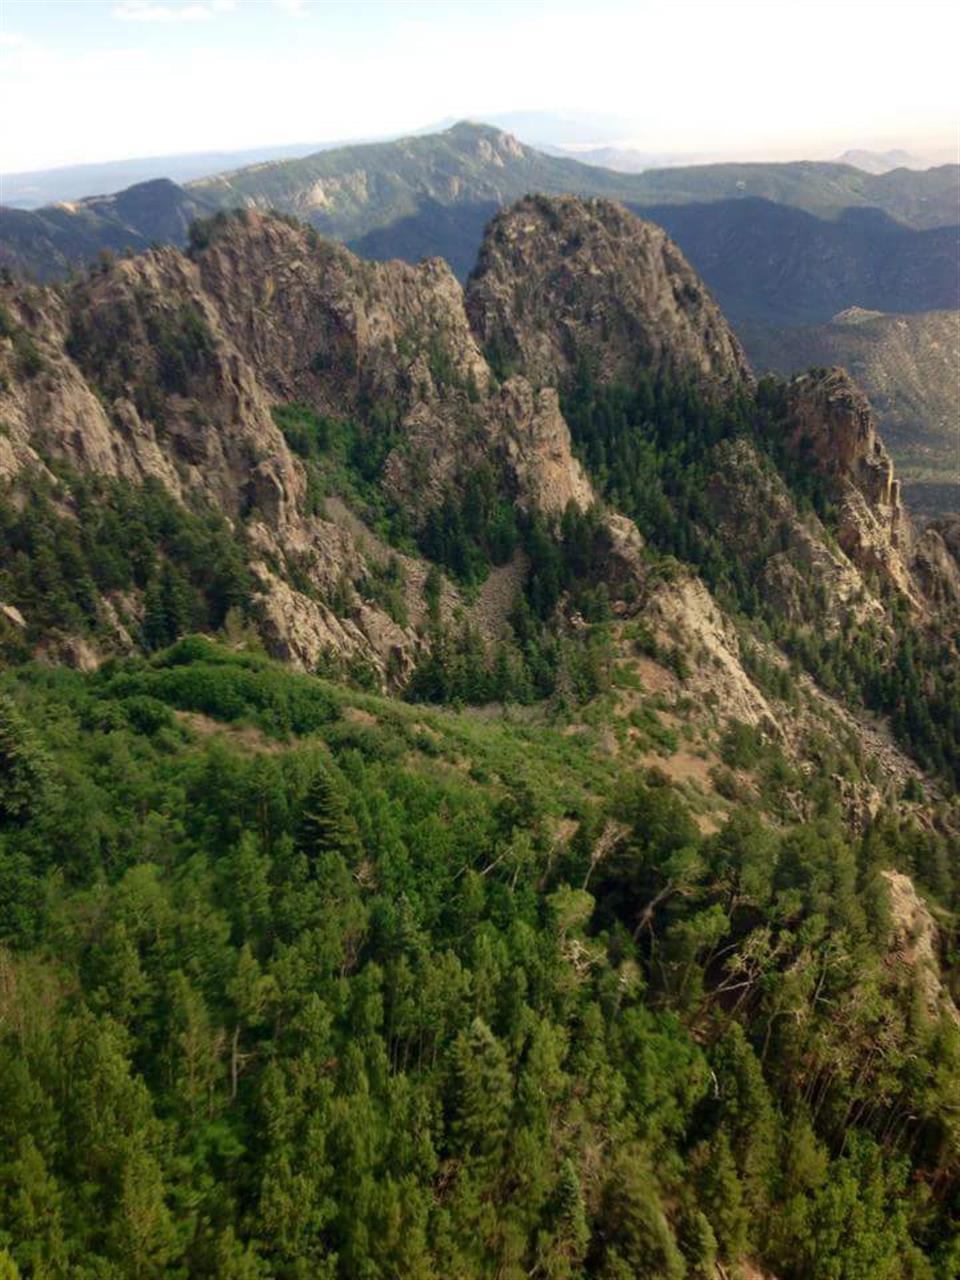 Tramway View of Sandia Mountains - Albuquerque, NM